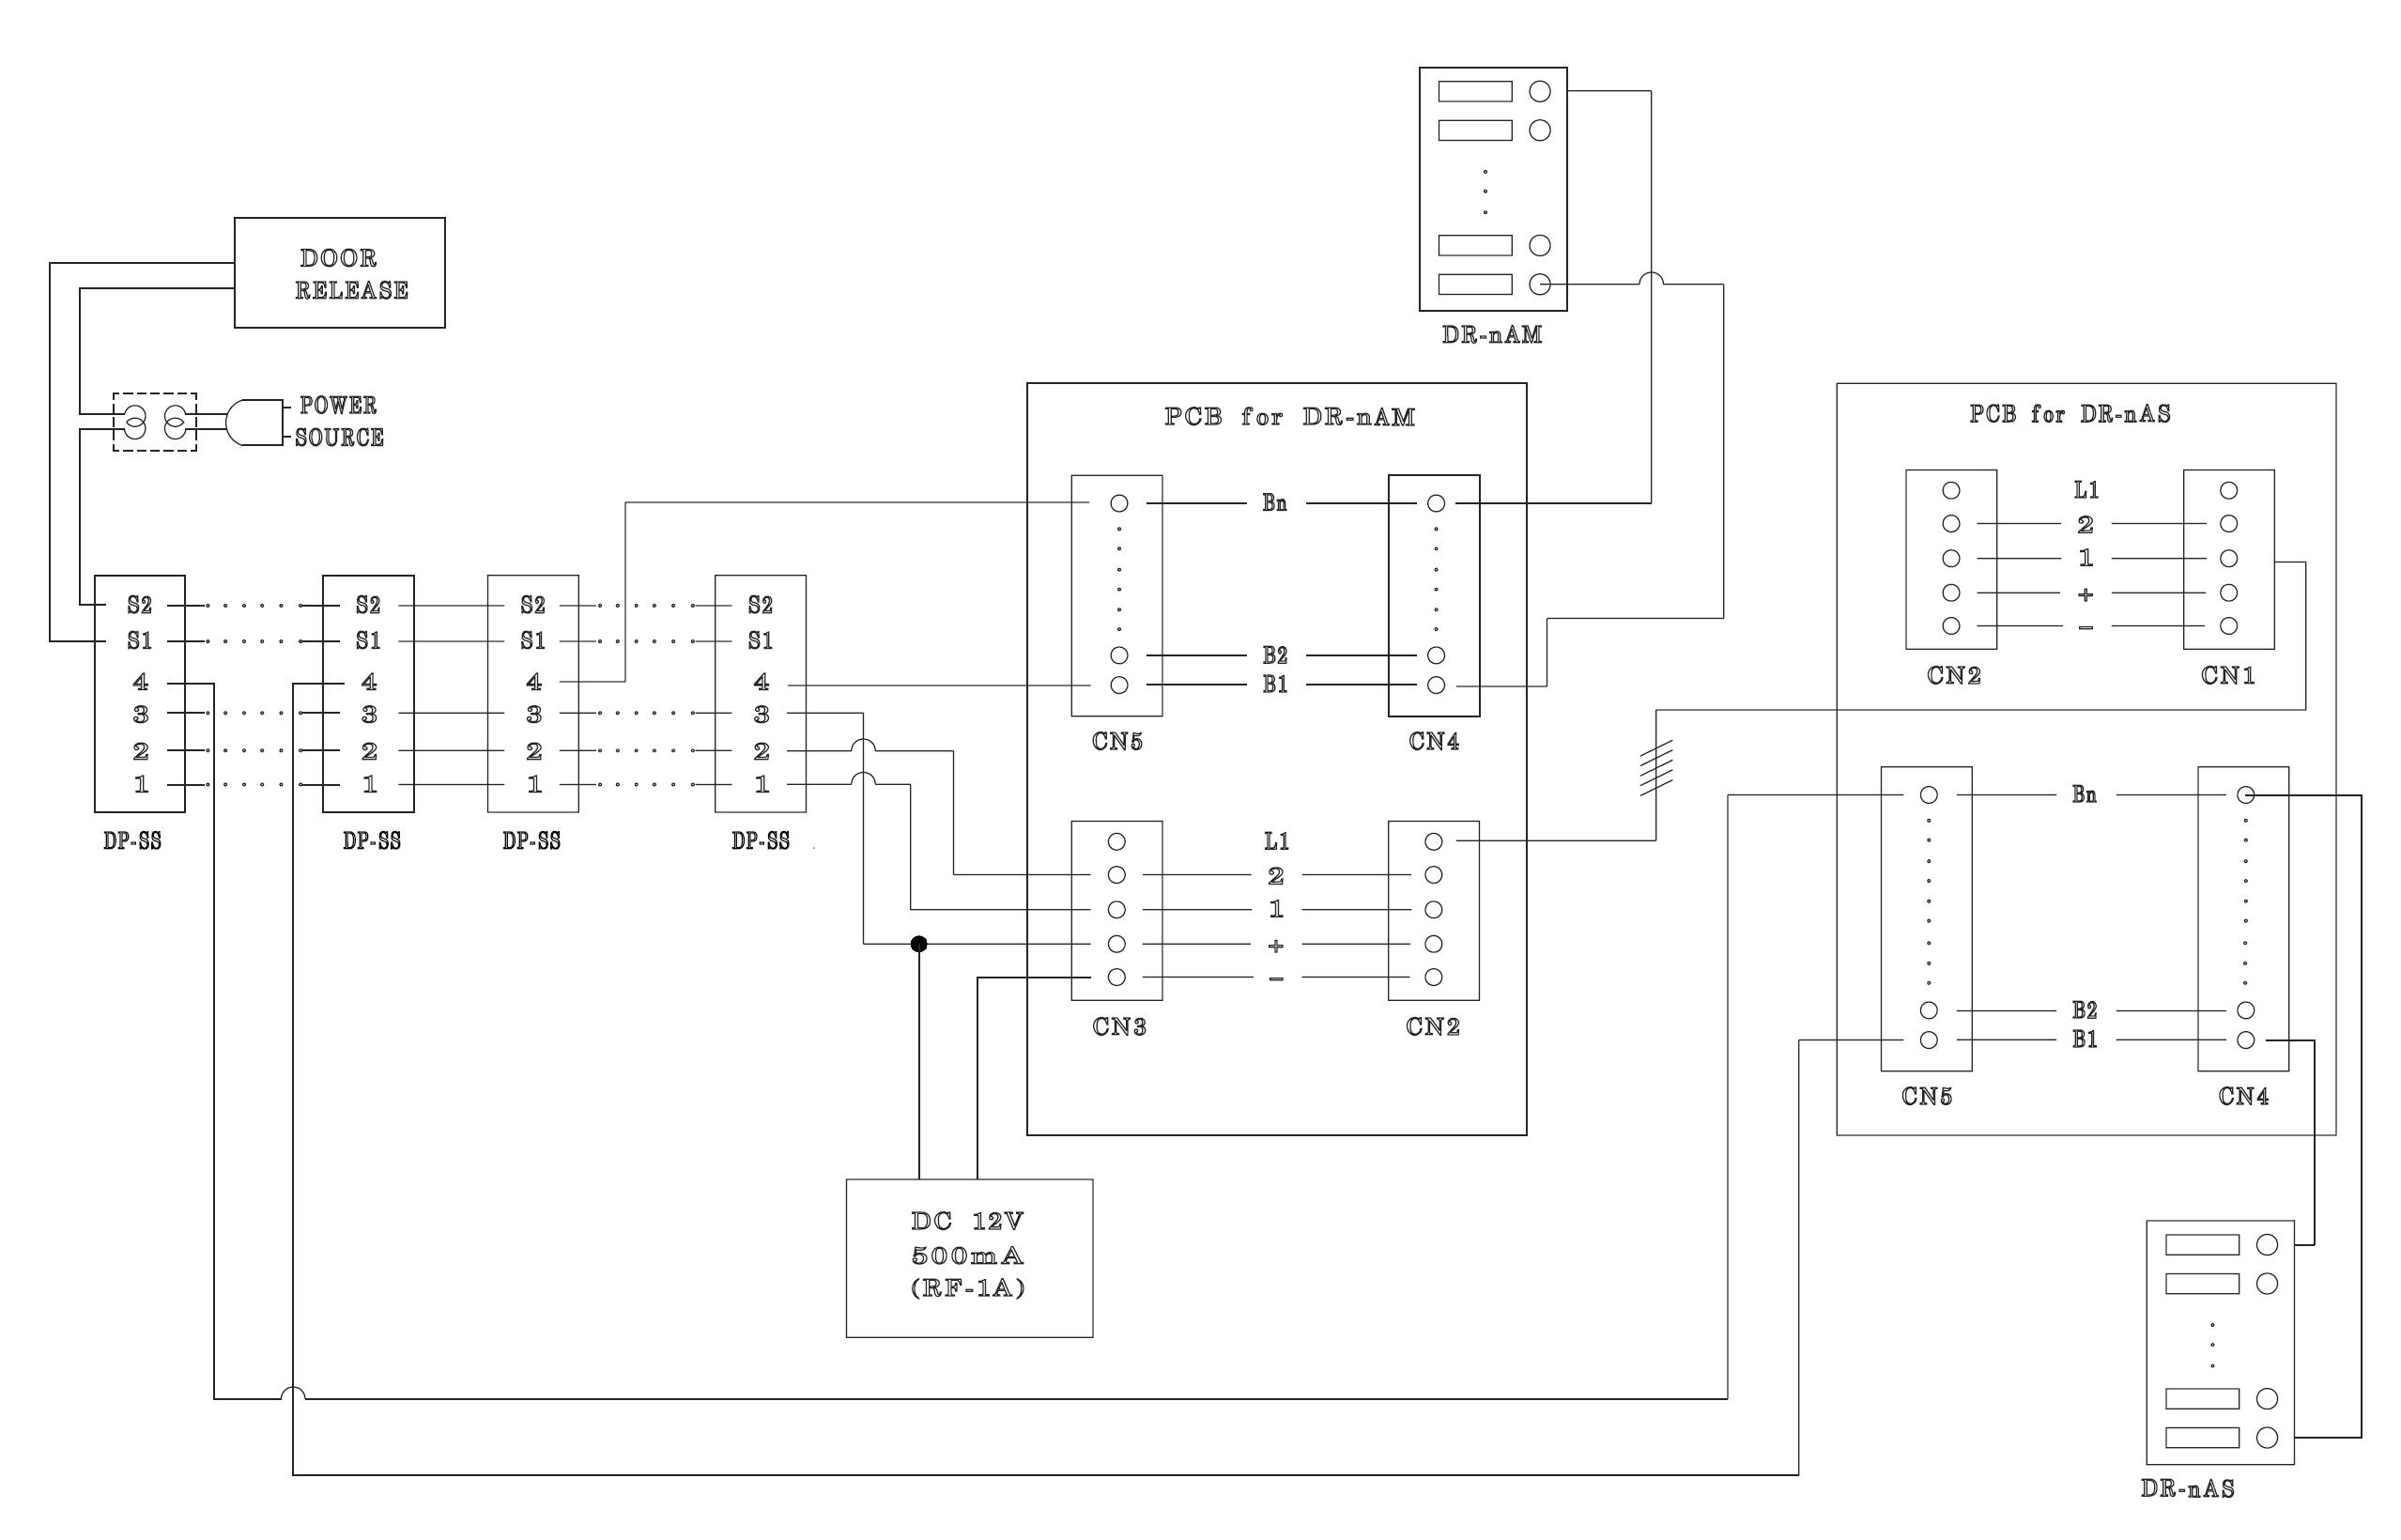 intercom wiring diagram troy bilt tiller carburetor comelit diagrams hvac elsavadorla